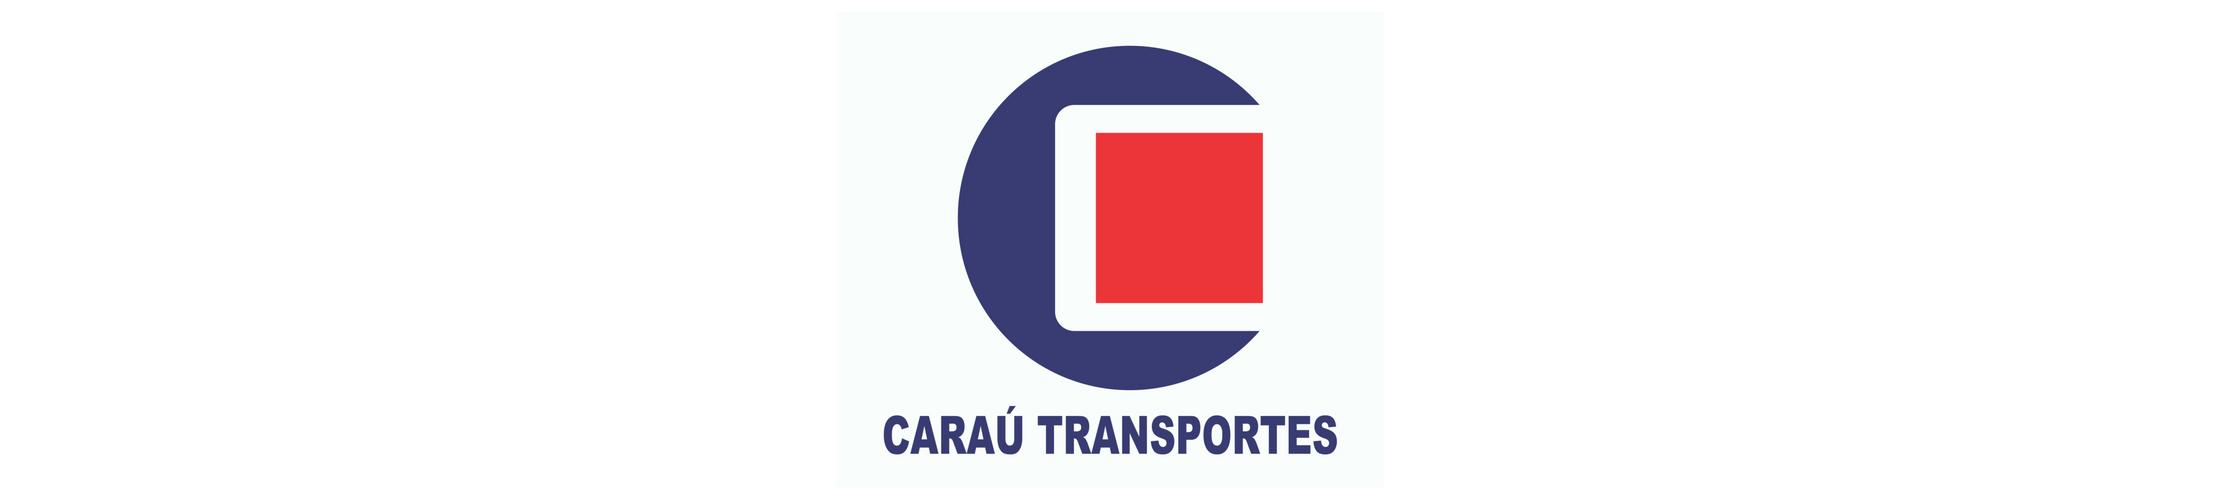 CARAU-TRANSPORTES-logo.png